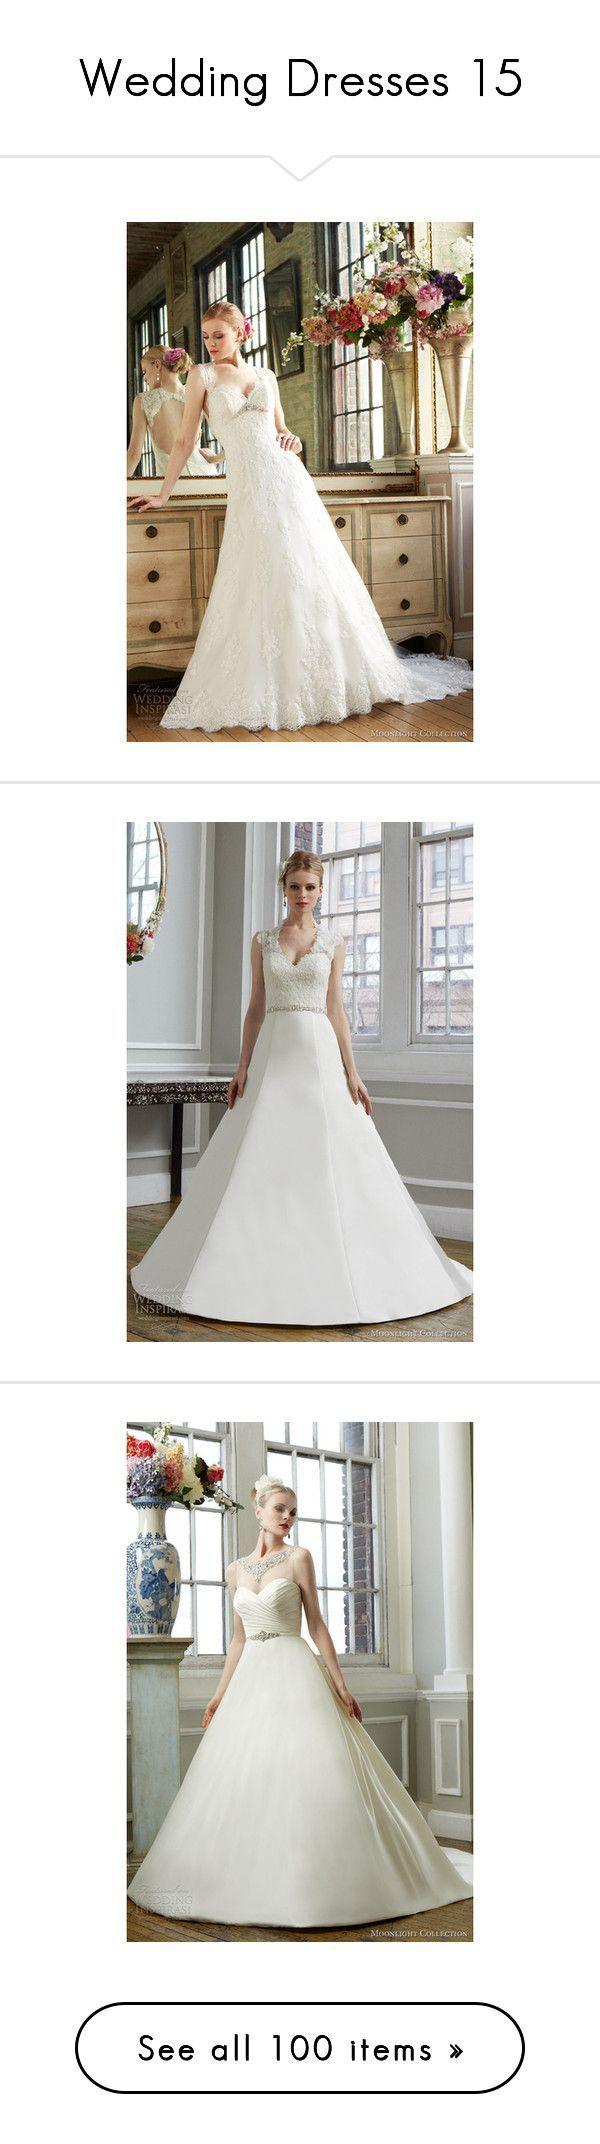 Wedding Dresses 15